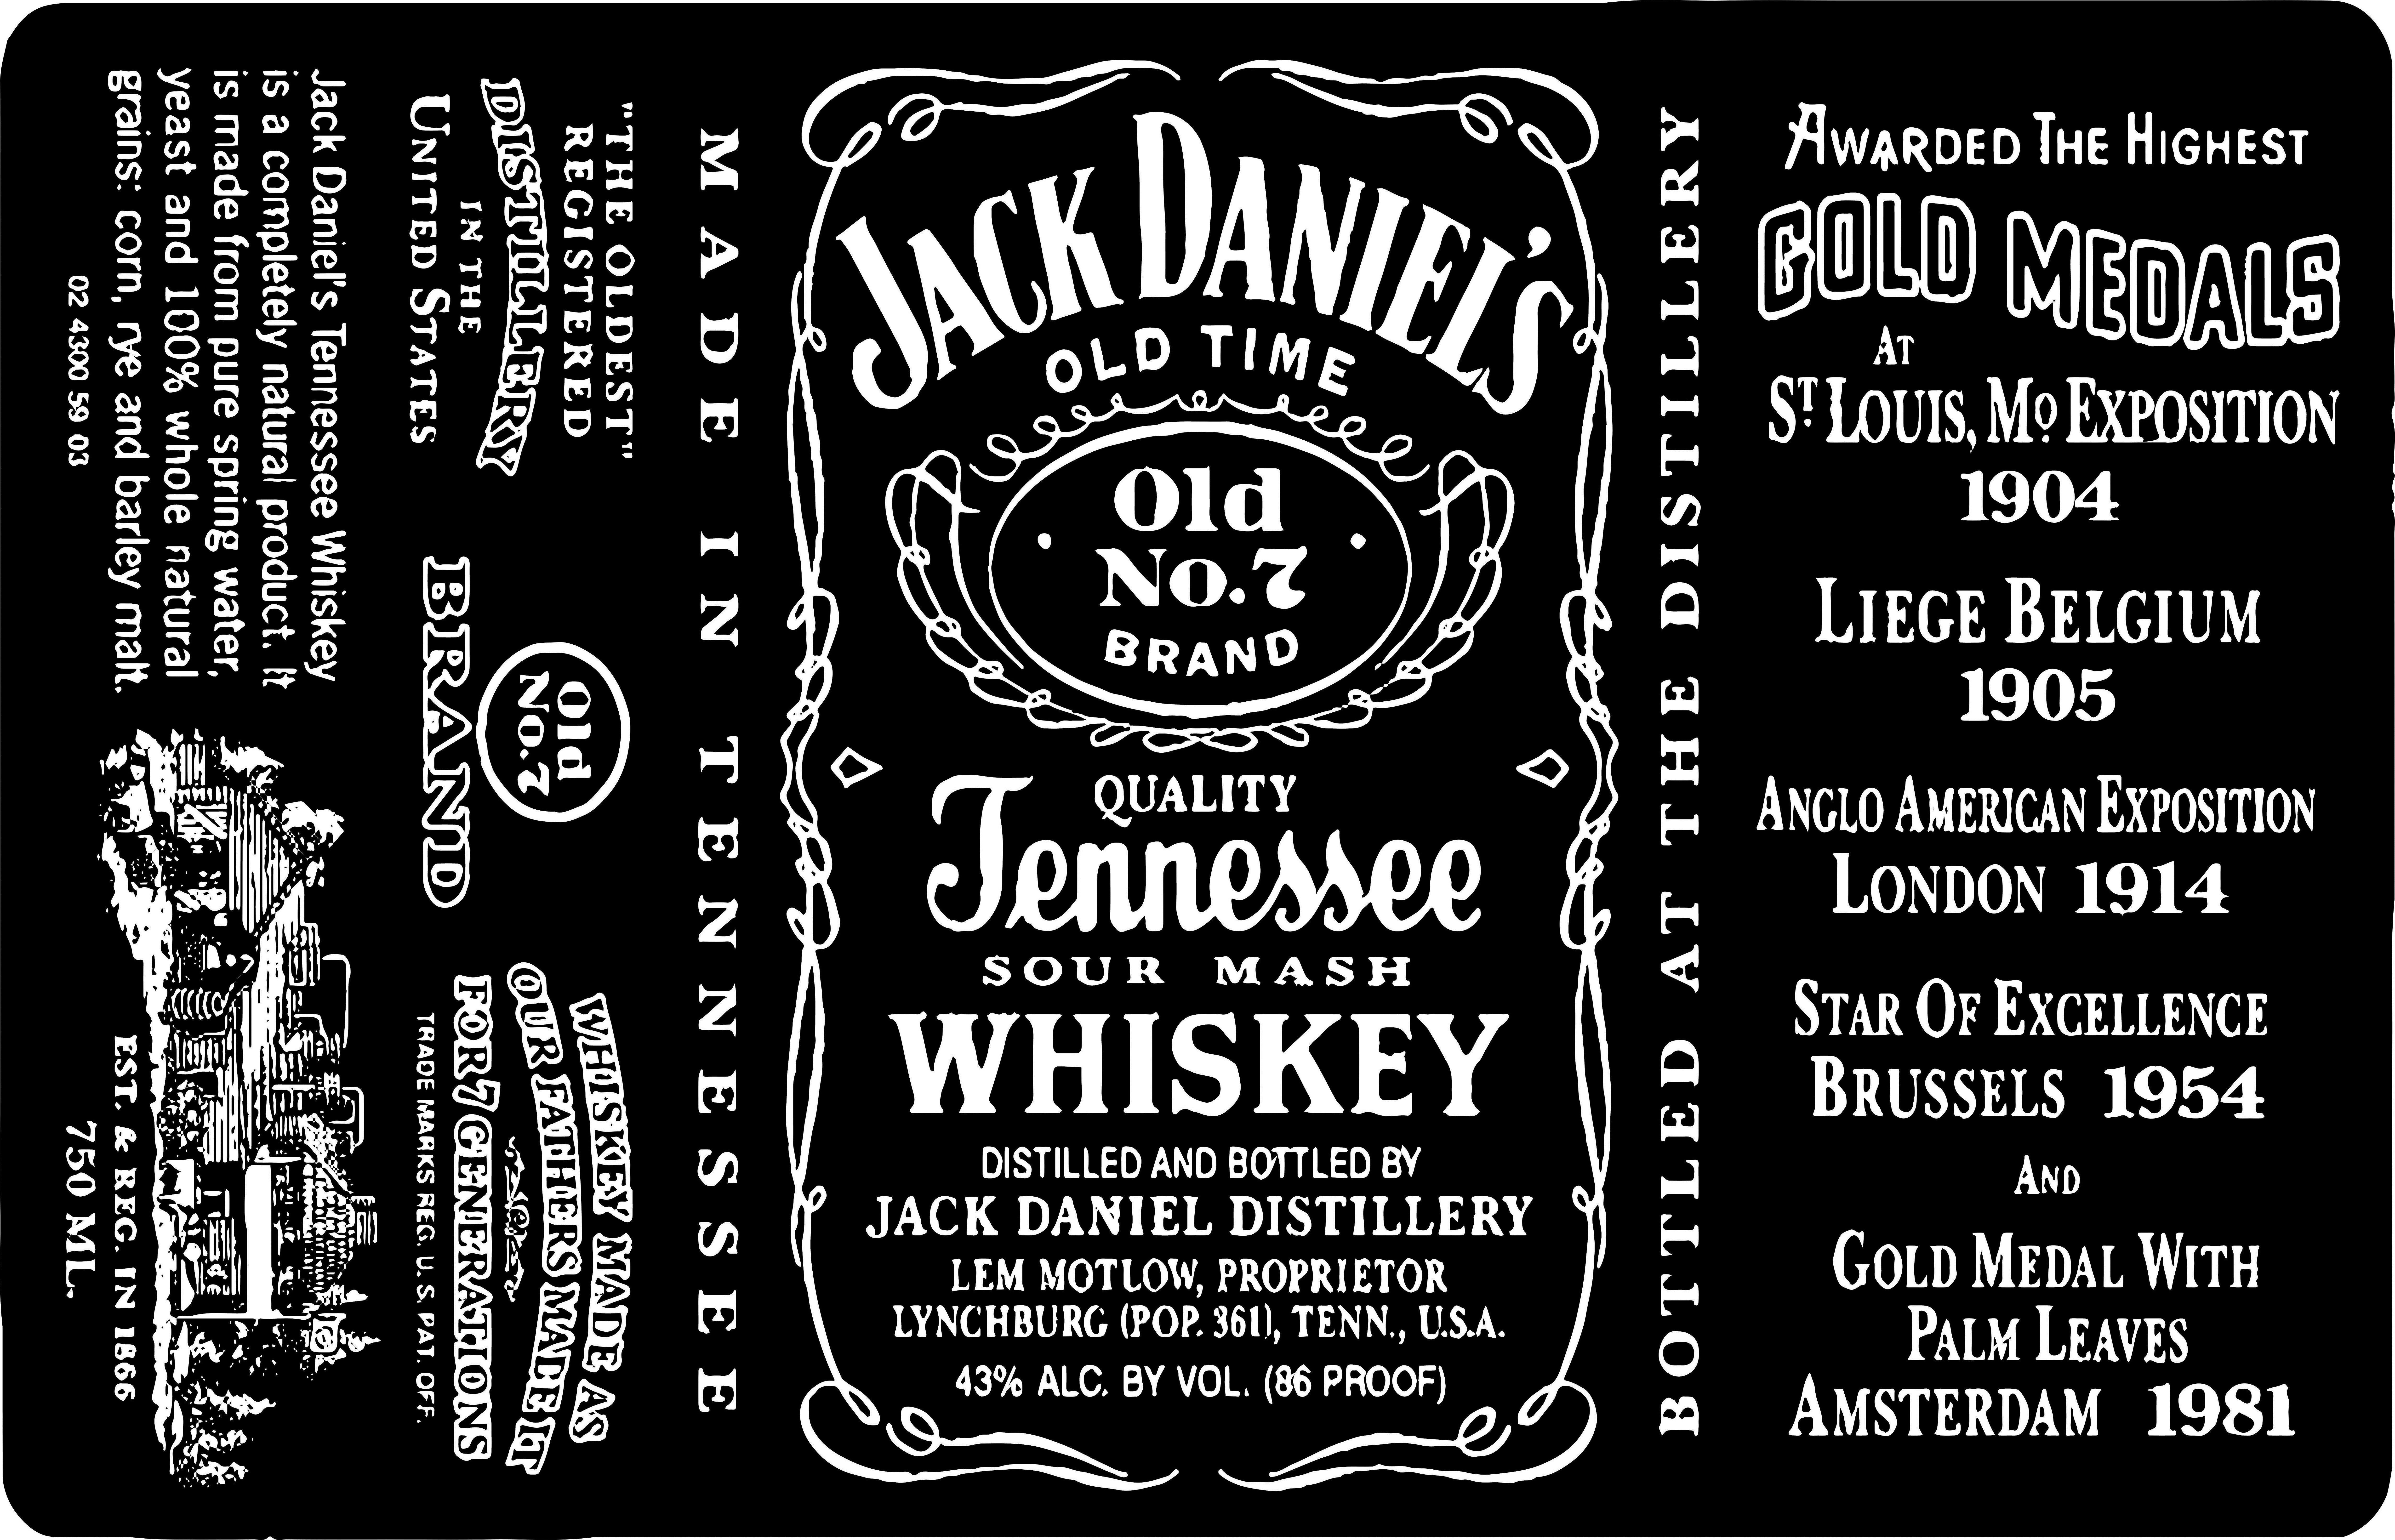 B9fe6a7 Jack Daniels Label Template Wiring Resources Inside Blank Jack Daniels Label Template Jack Daniels Label Jack Daniels Label Templates